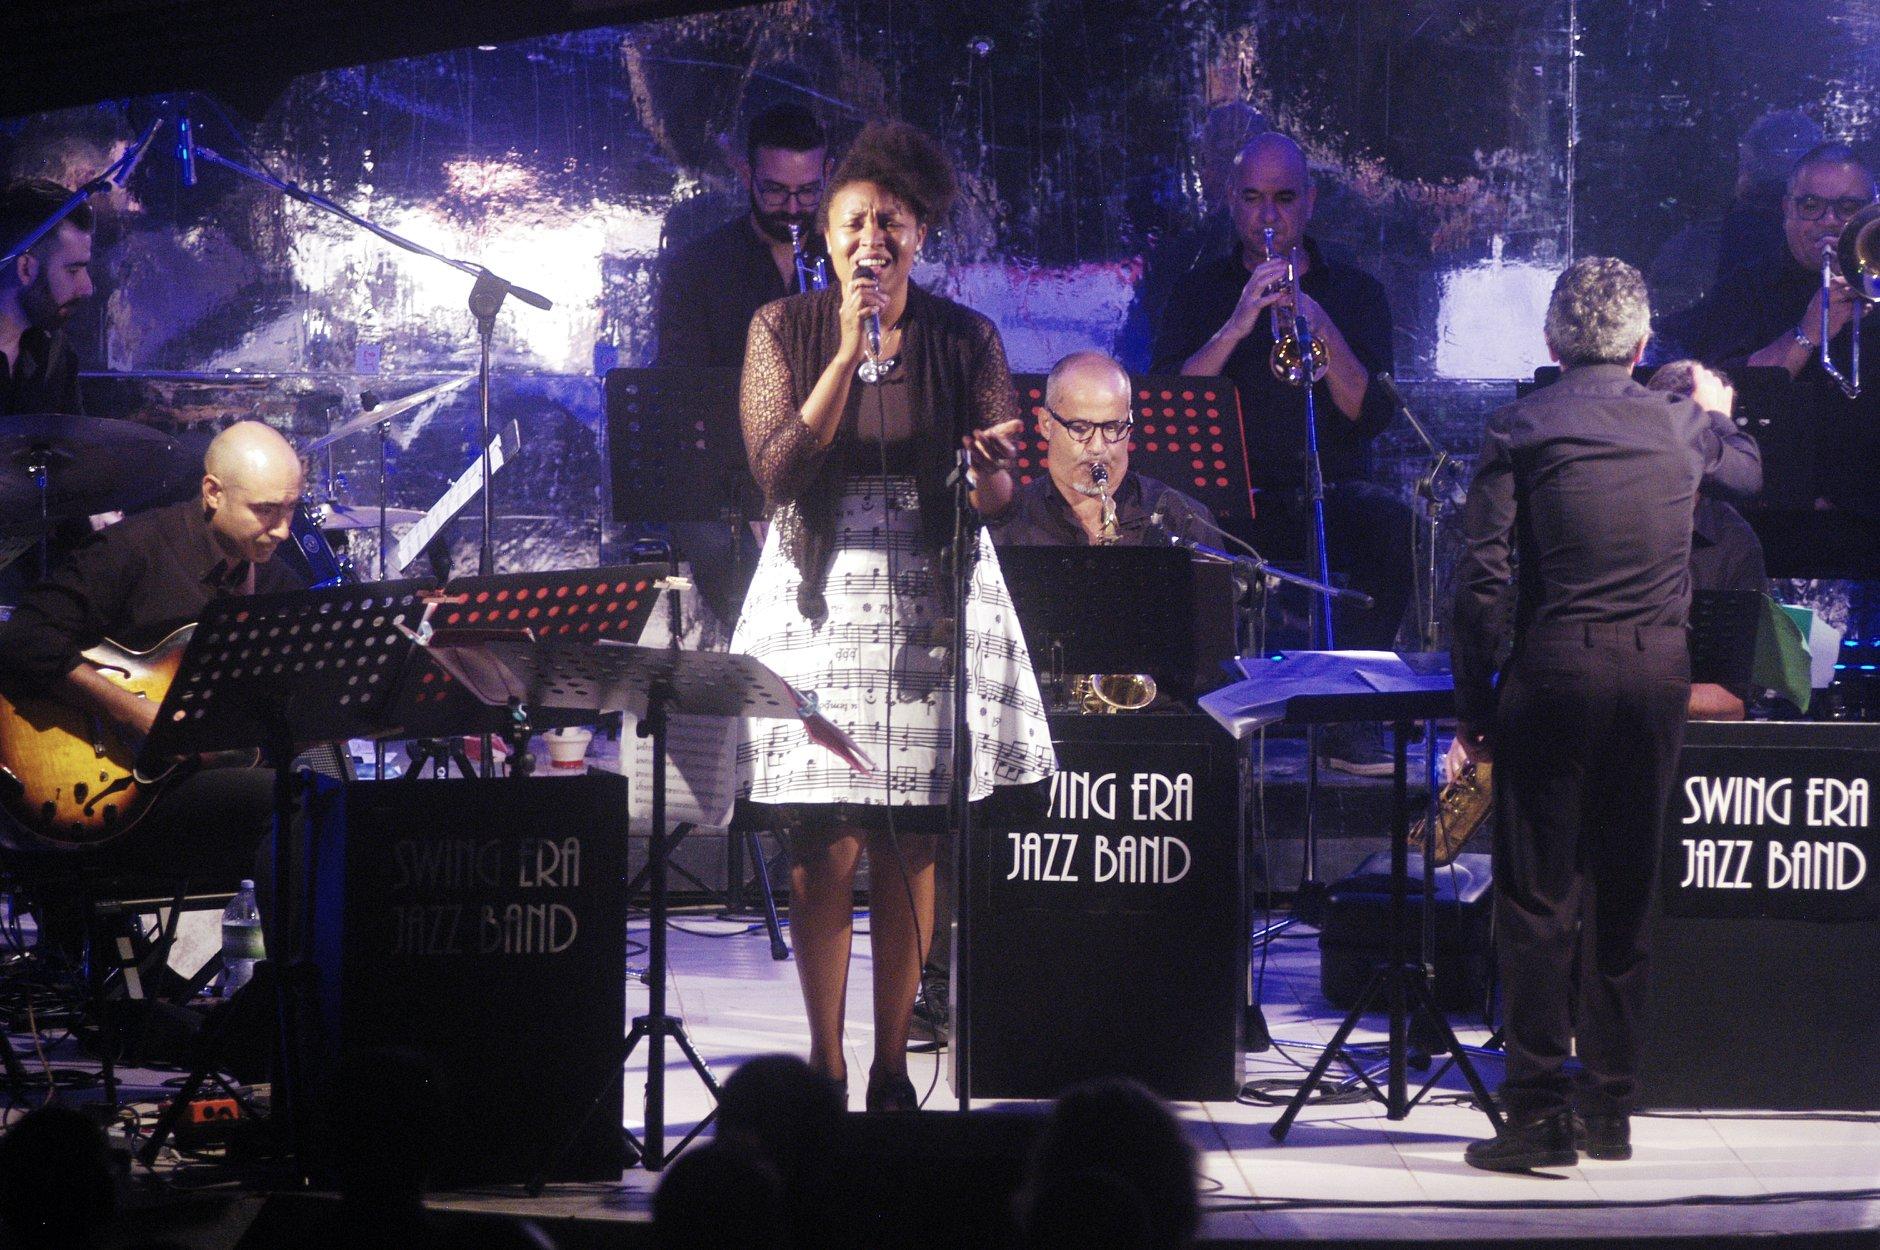 Swing Era Jazz Band Denise Gueye ph. G. Palitta 1